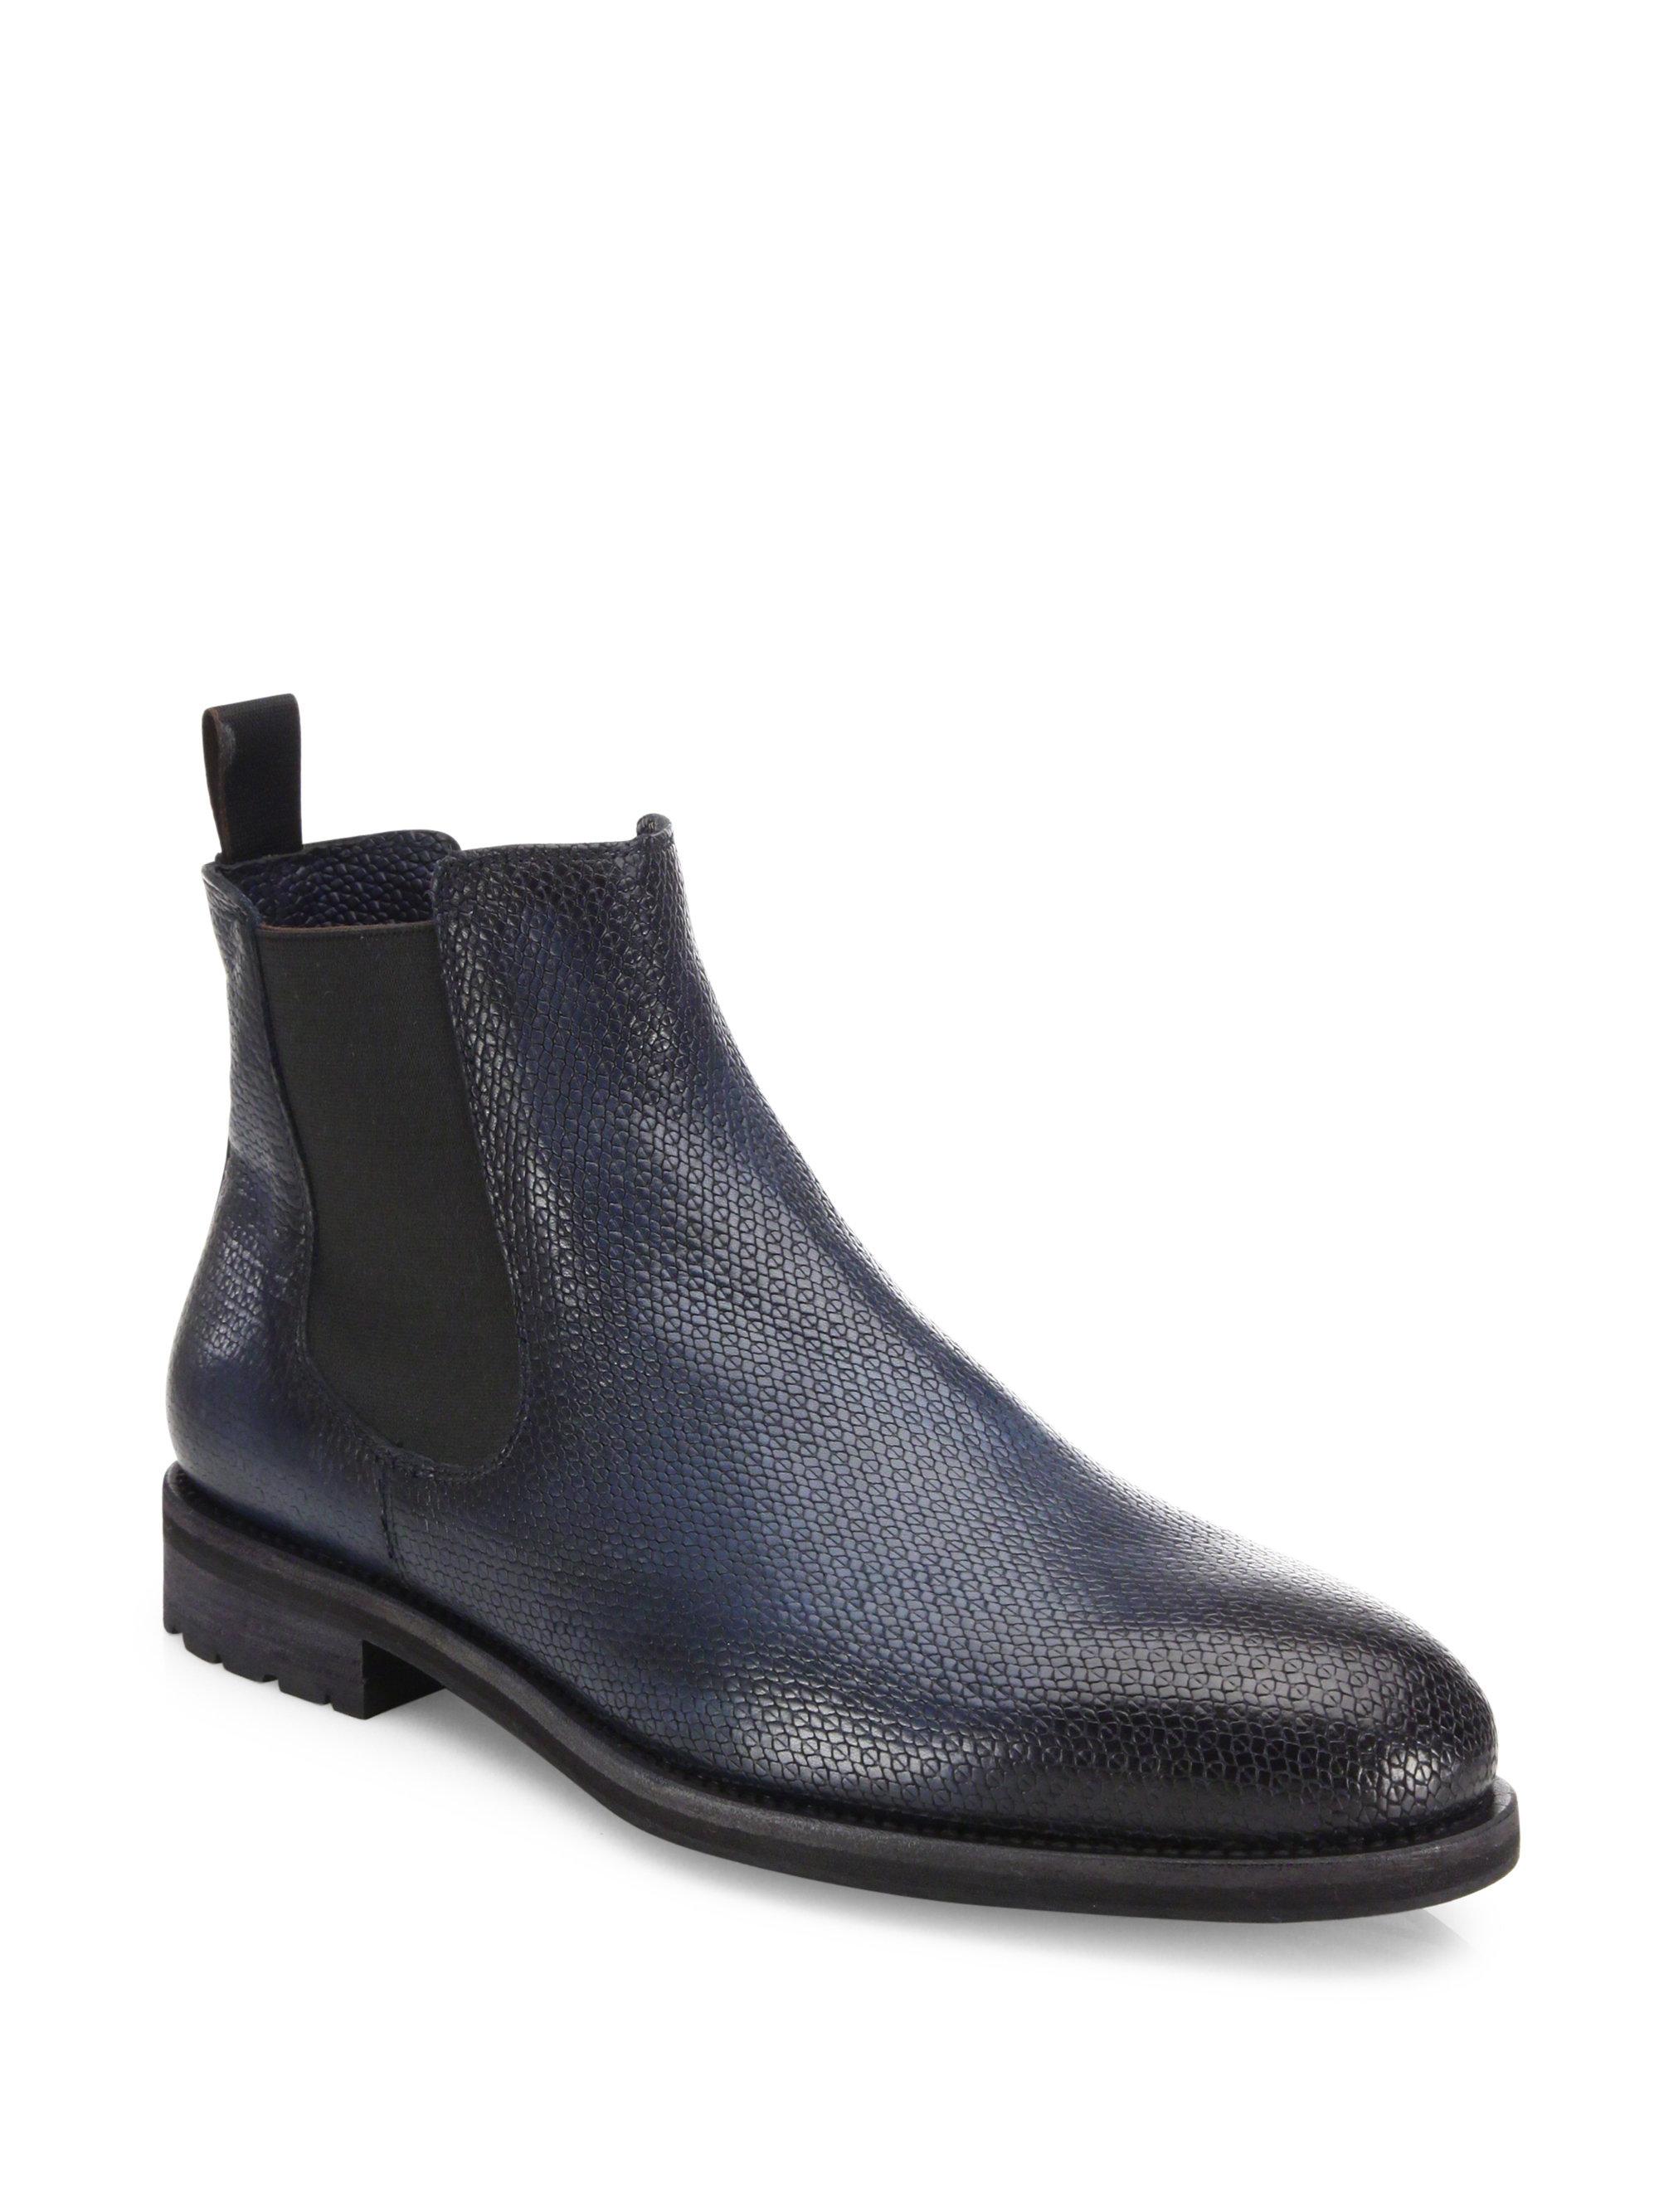 santoni shearling lined chelsea boots in blue for men lyst. Black Bedroom Furniture Sets. Home Design Ideas